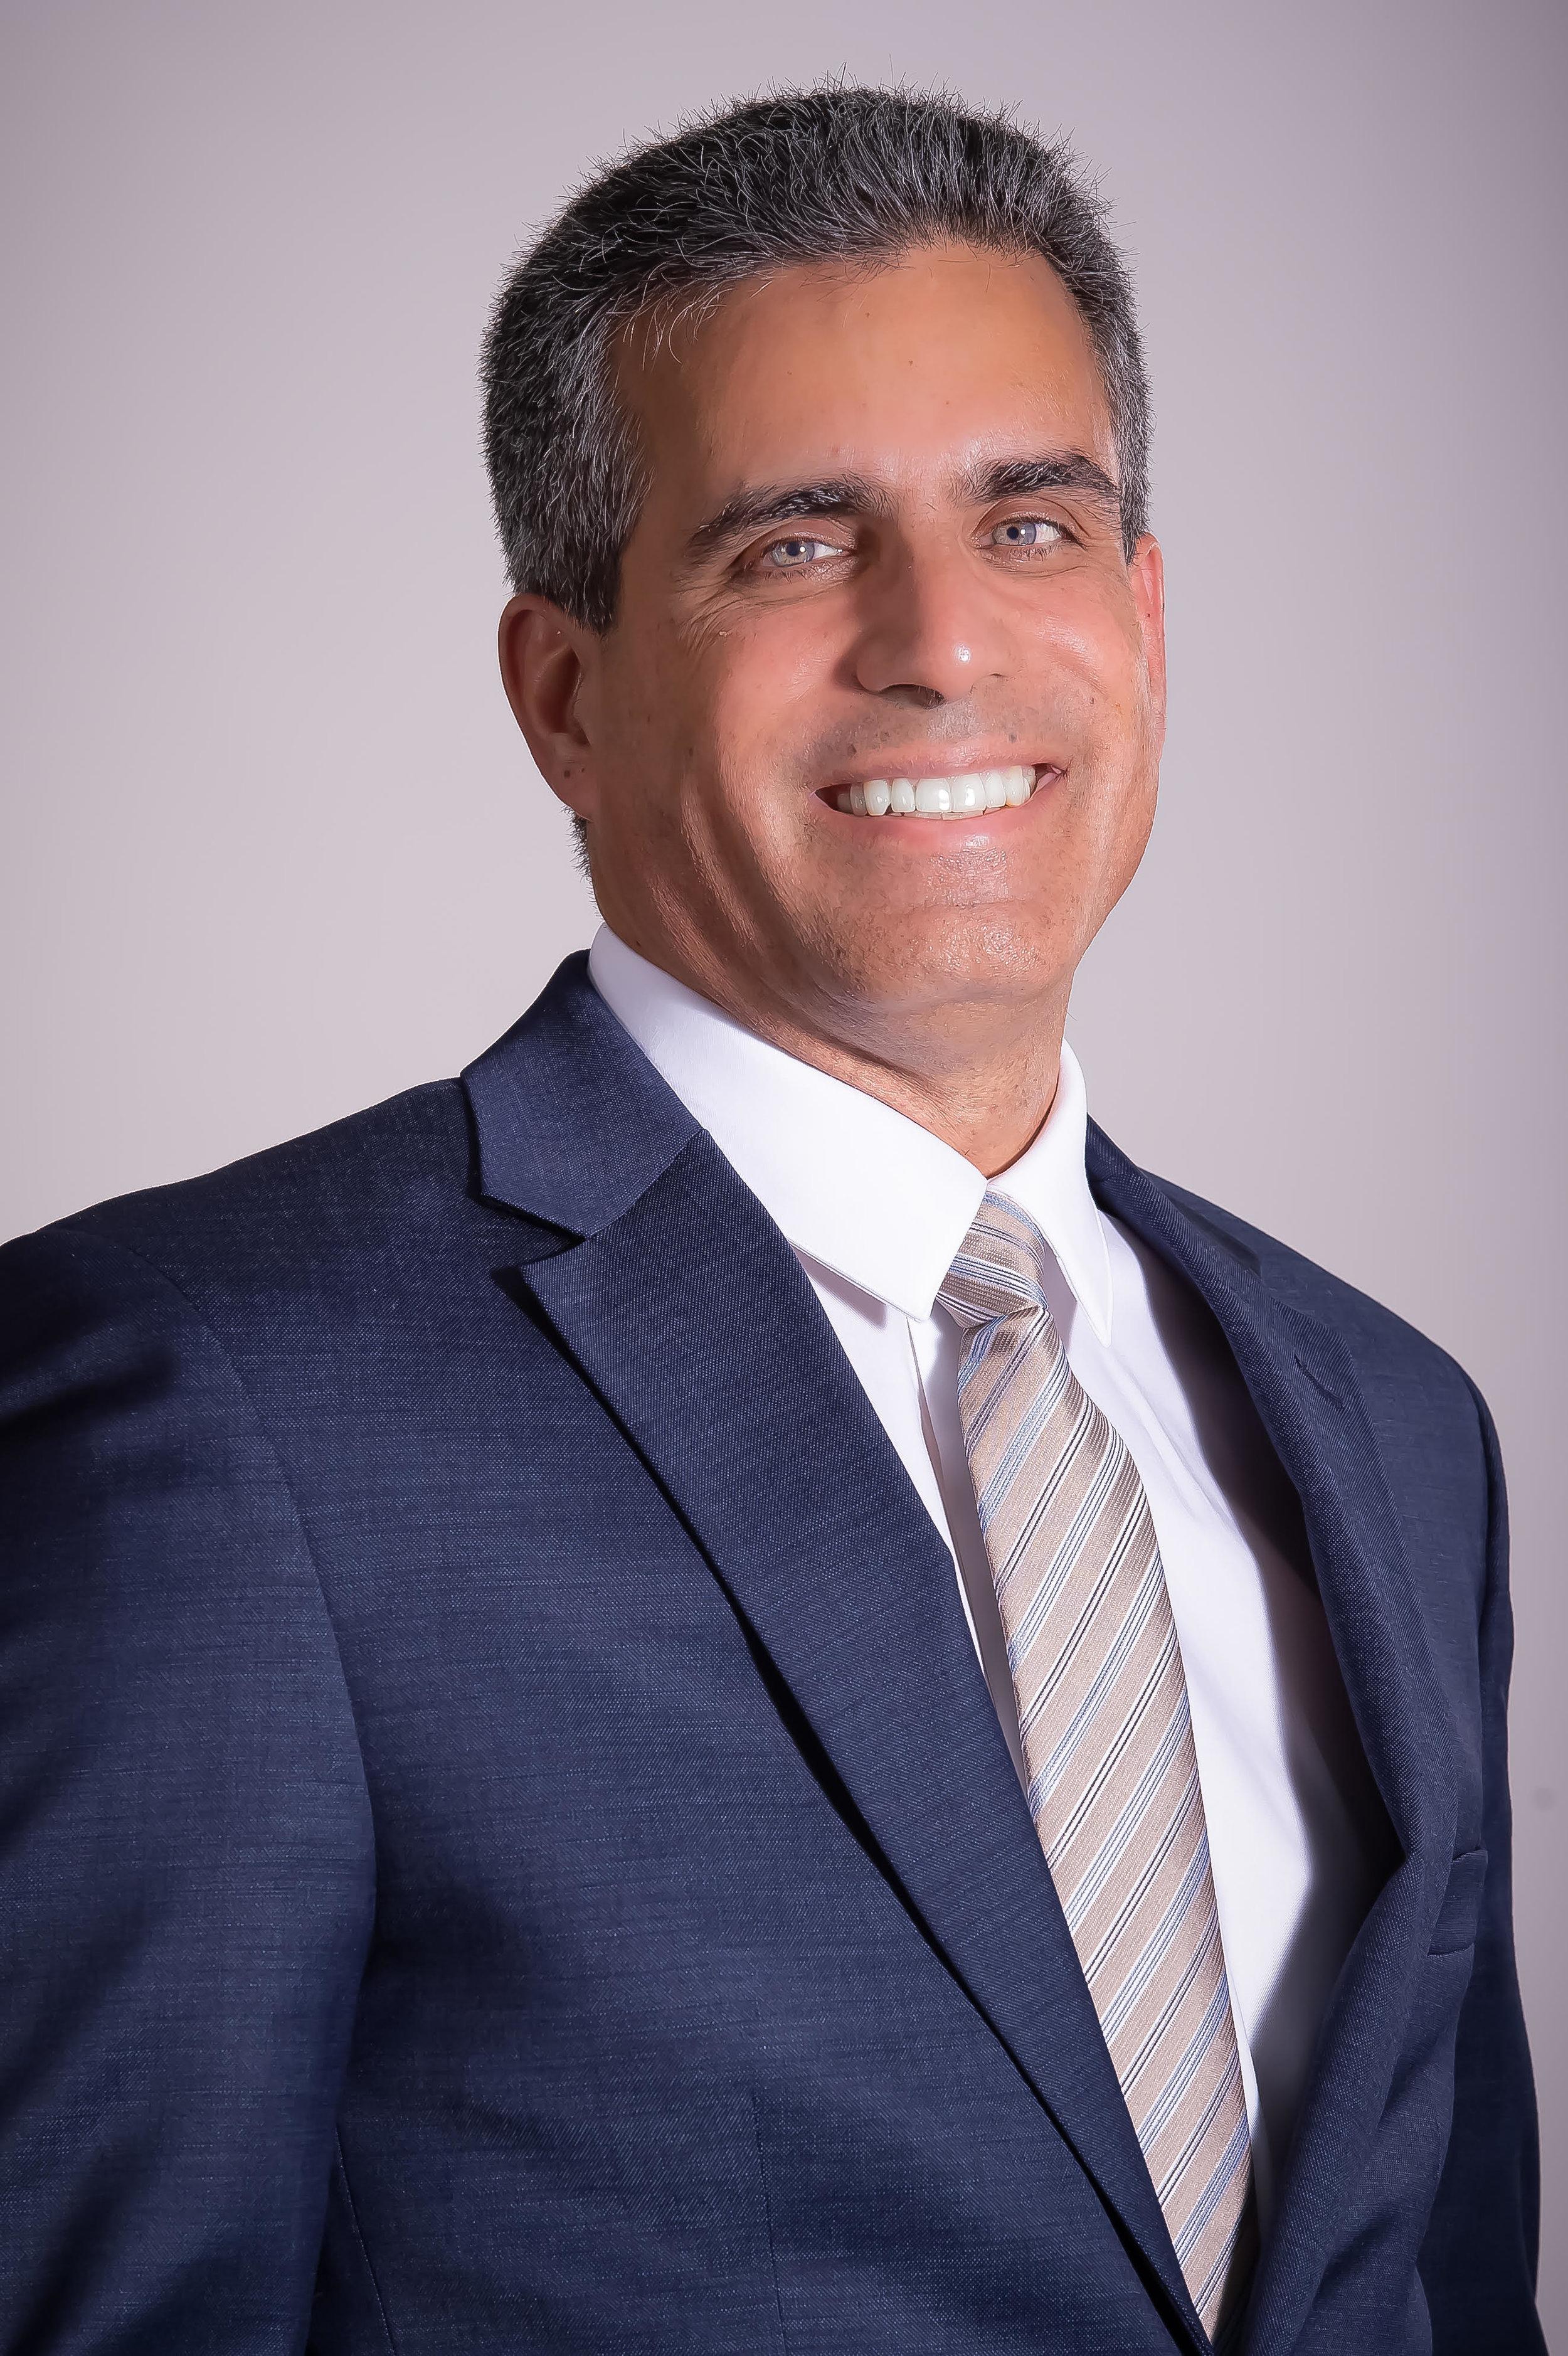 David Rodriguez - davidr@NicklausLaw.com